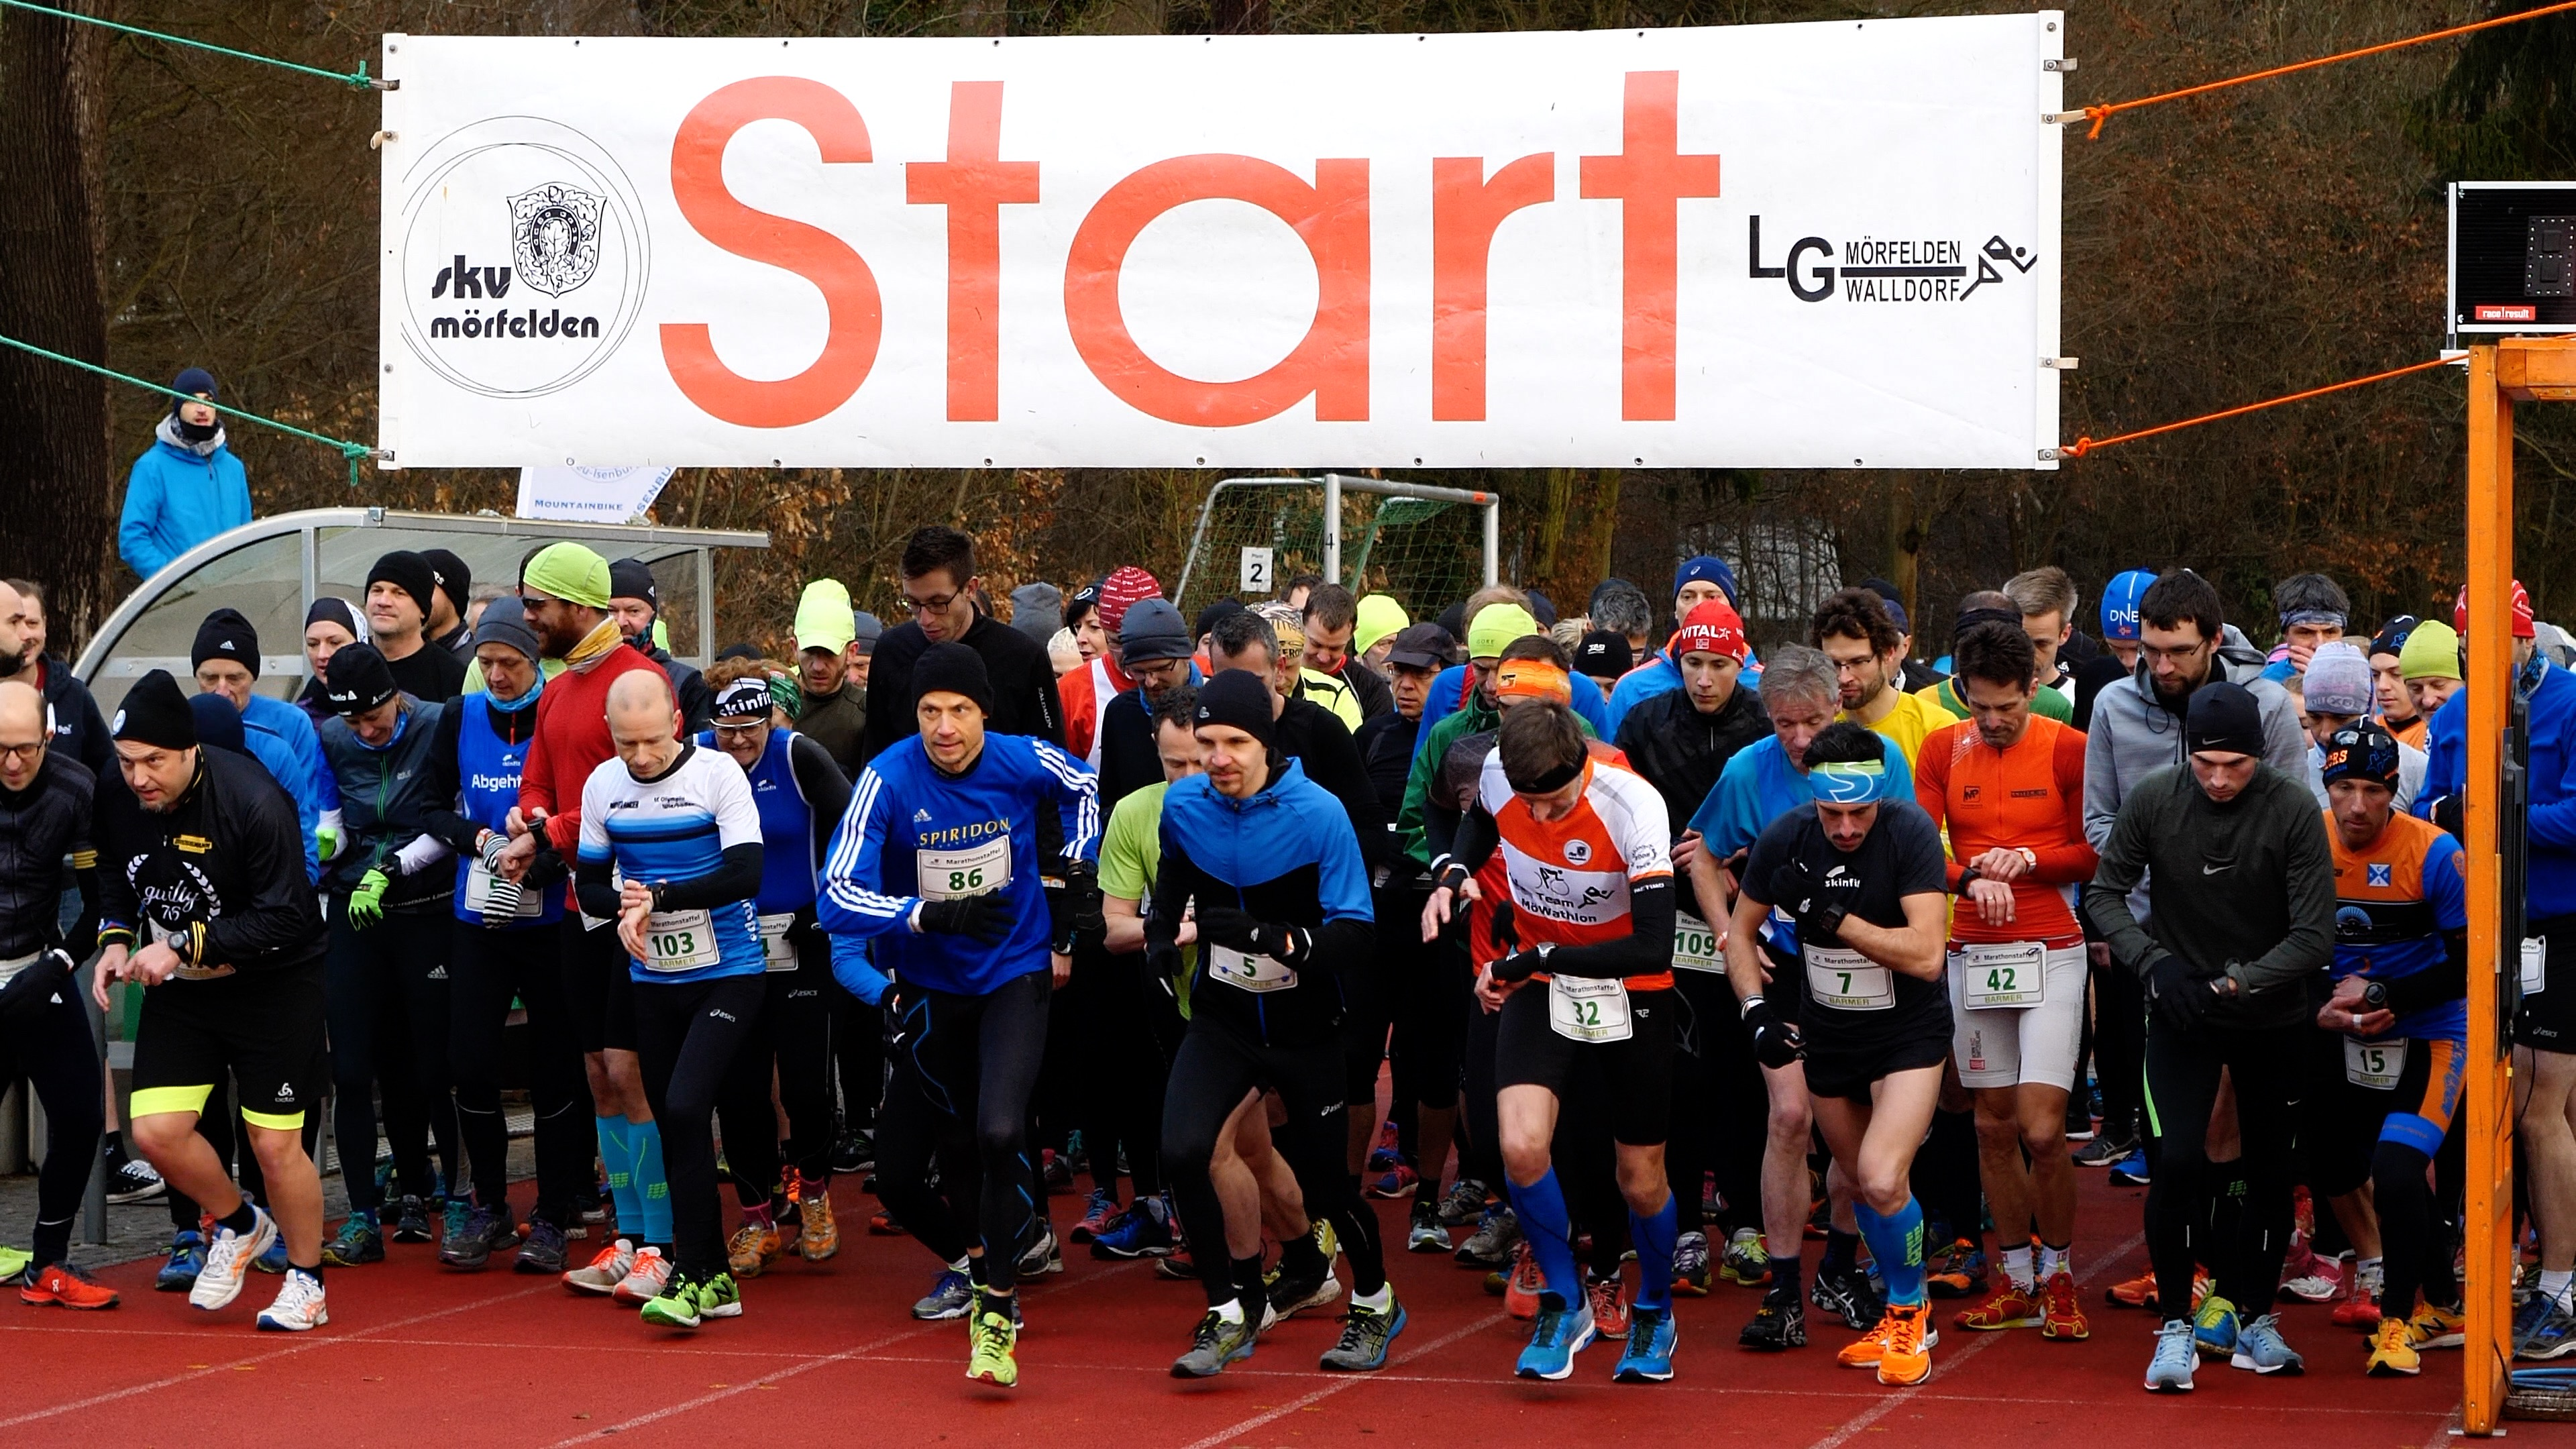 Marathonstaffel Mörfelden 2018